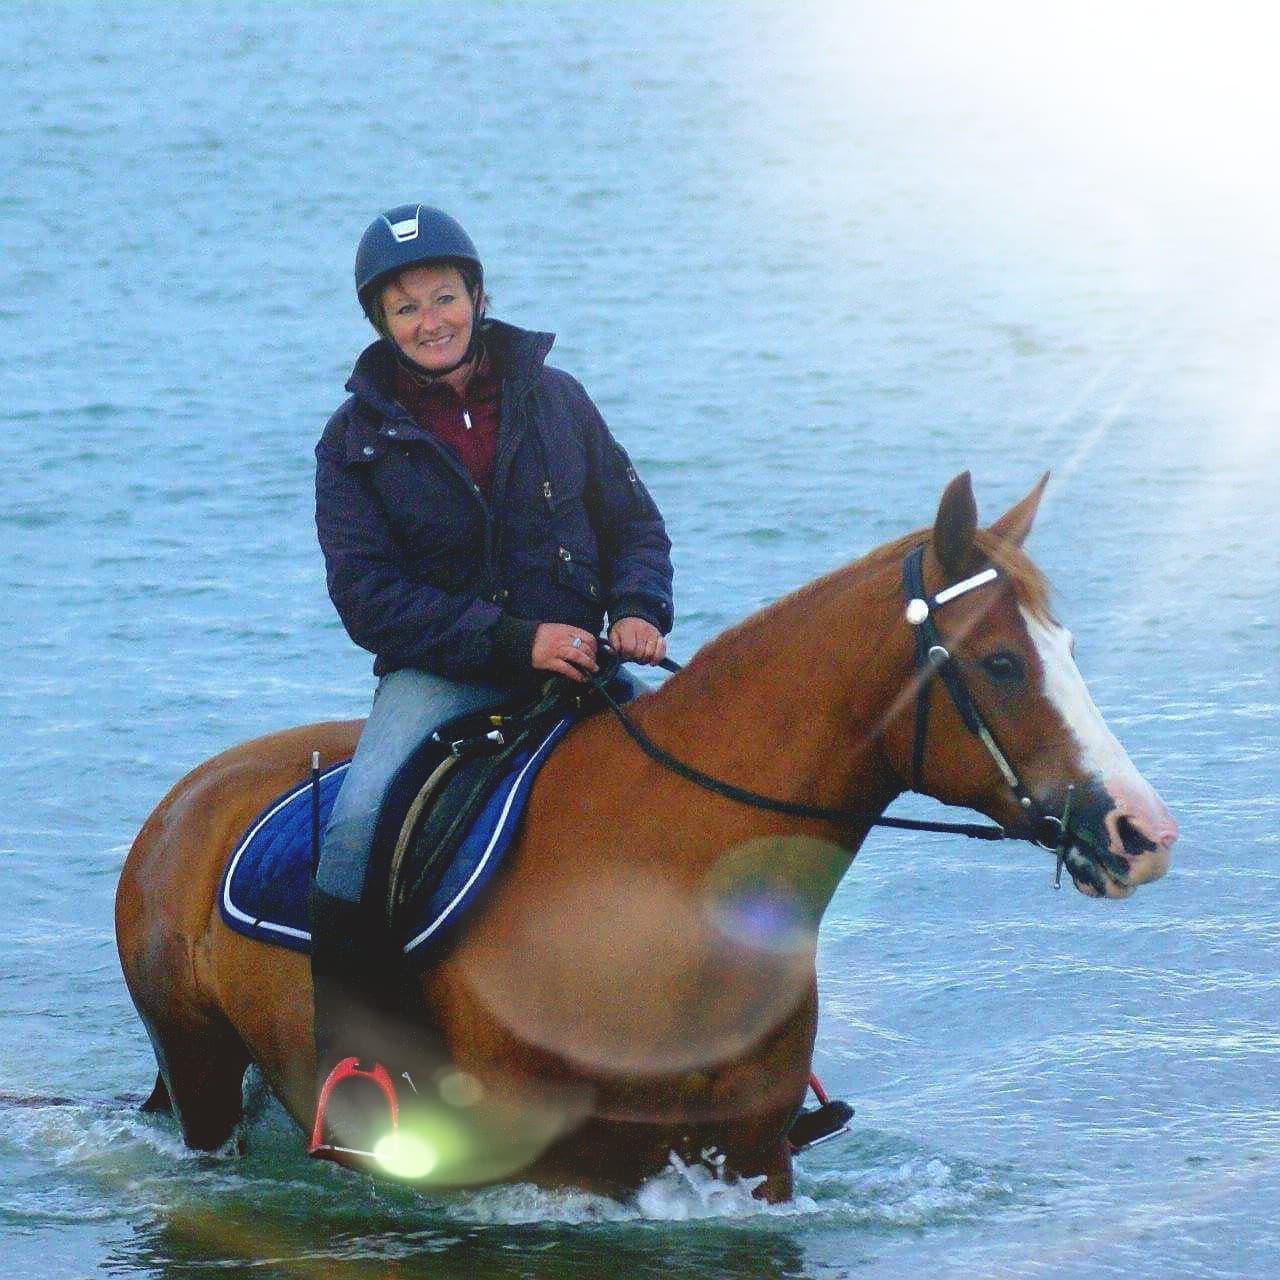 Baignade équestre sur balade mer a cheval